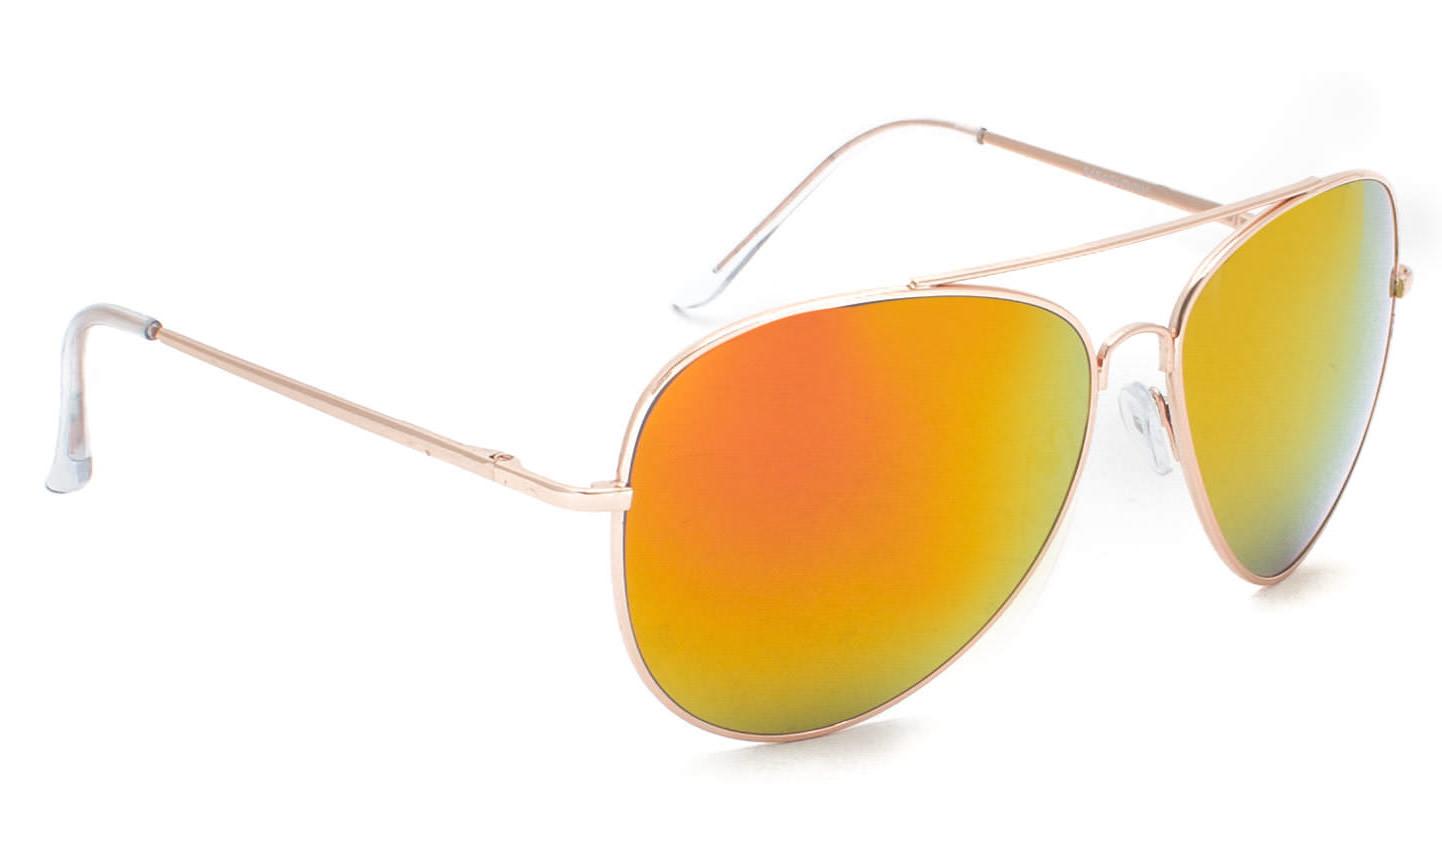 national sunglasses day viva glam magazine -de colores sunglasses